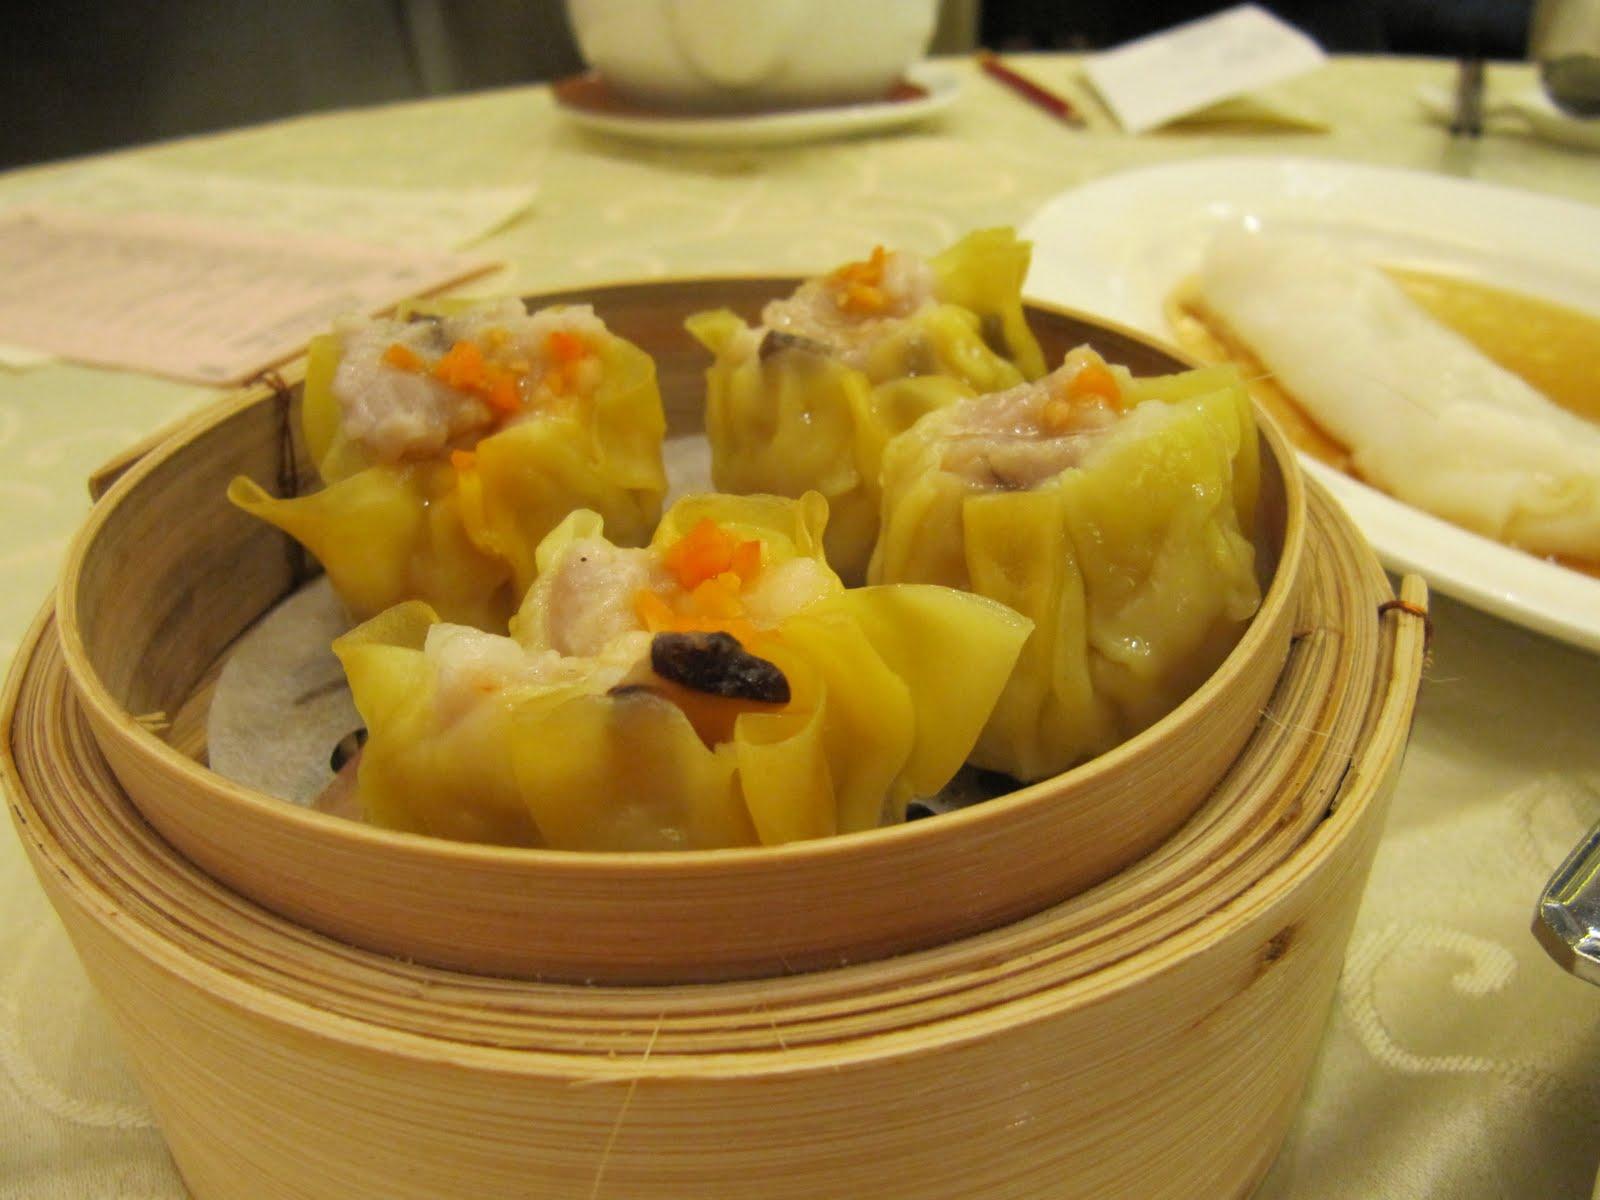 Portland Poncho: A Traditional Chinese Breakfast, Dim Sum